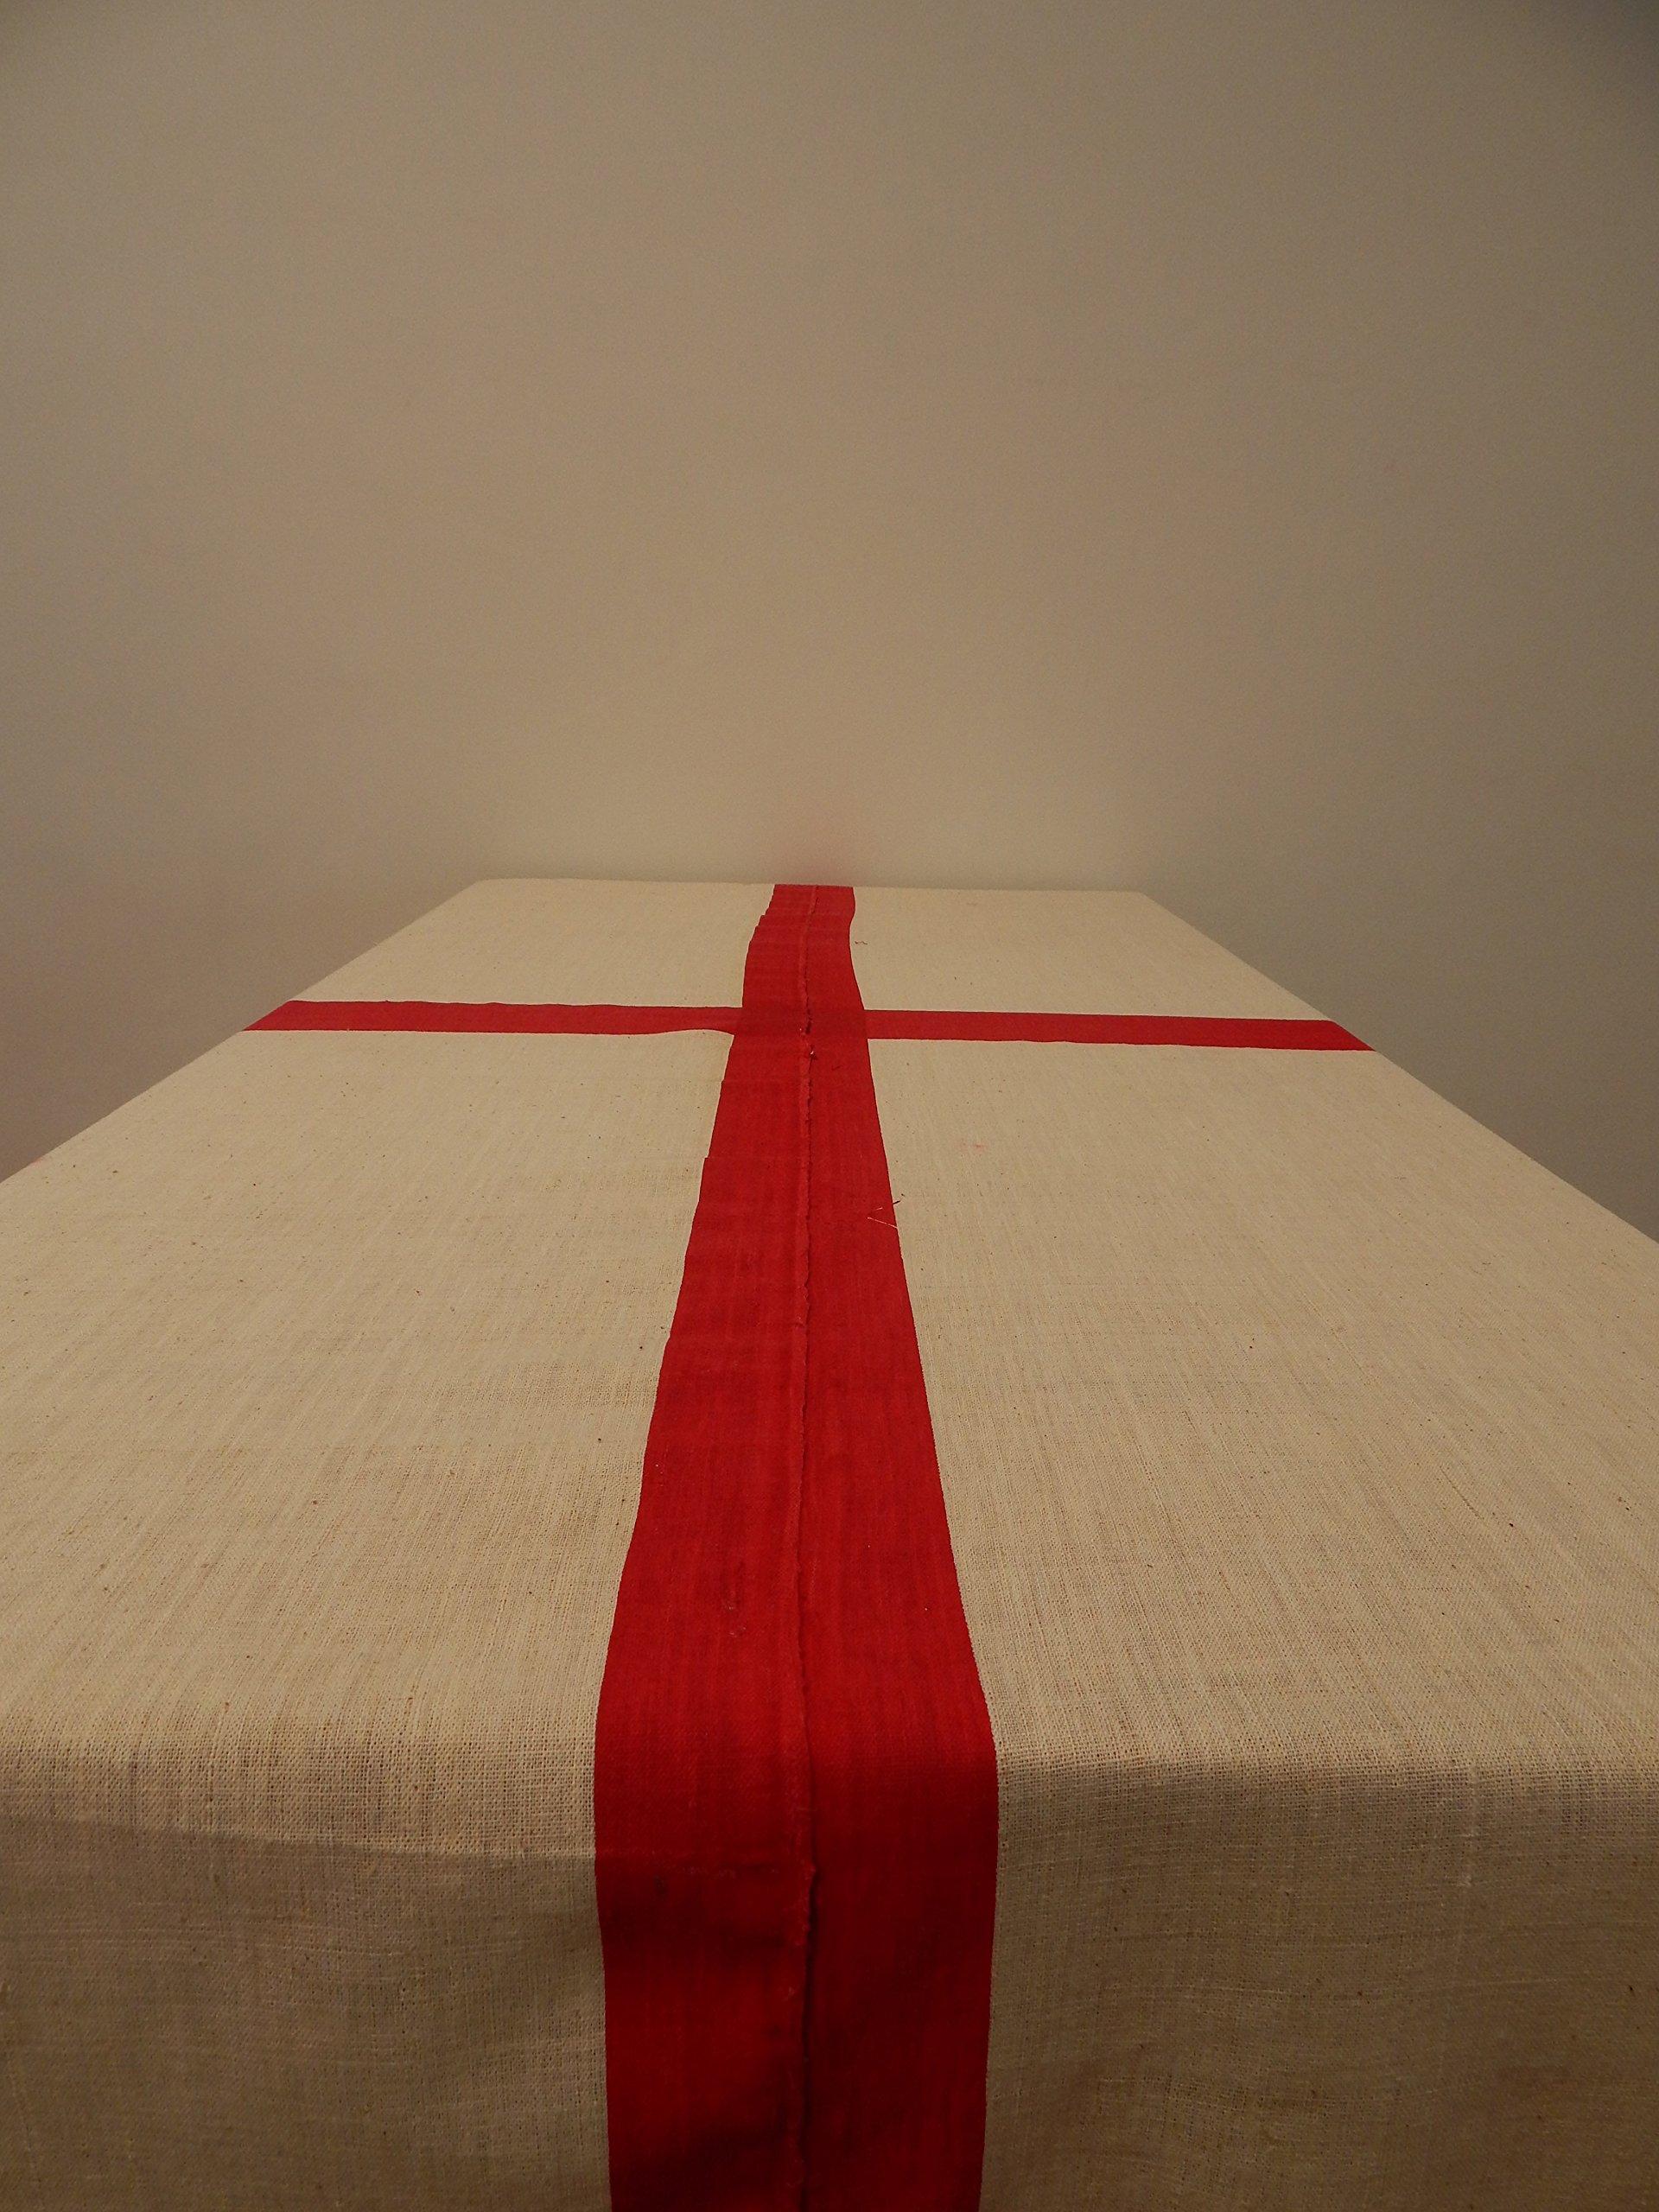 Gitika Goyal Home Cotton Khadi Silver Screen Printed Tablecloth with Square Design, white, 72'' x 72''